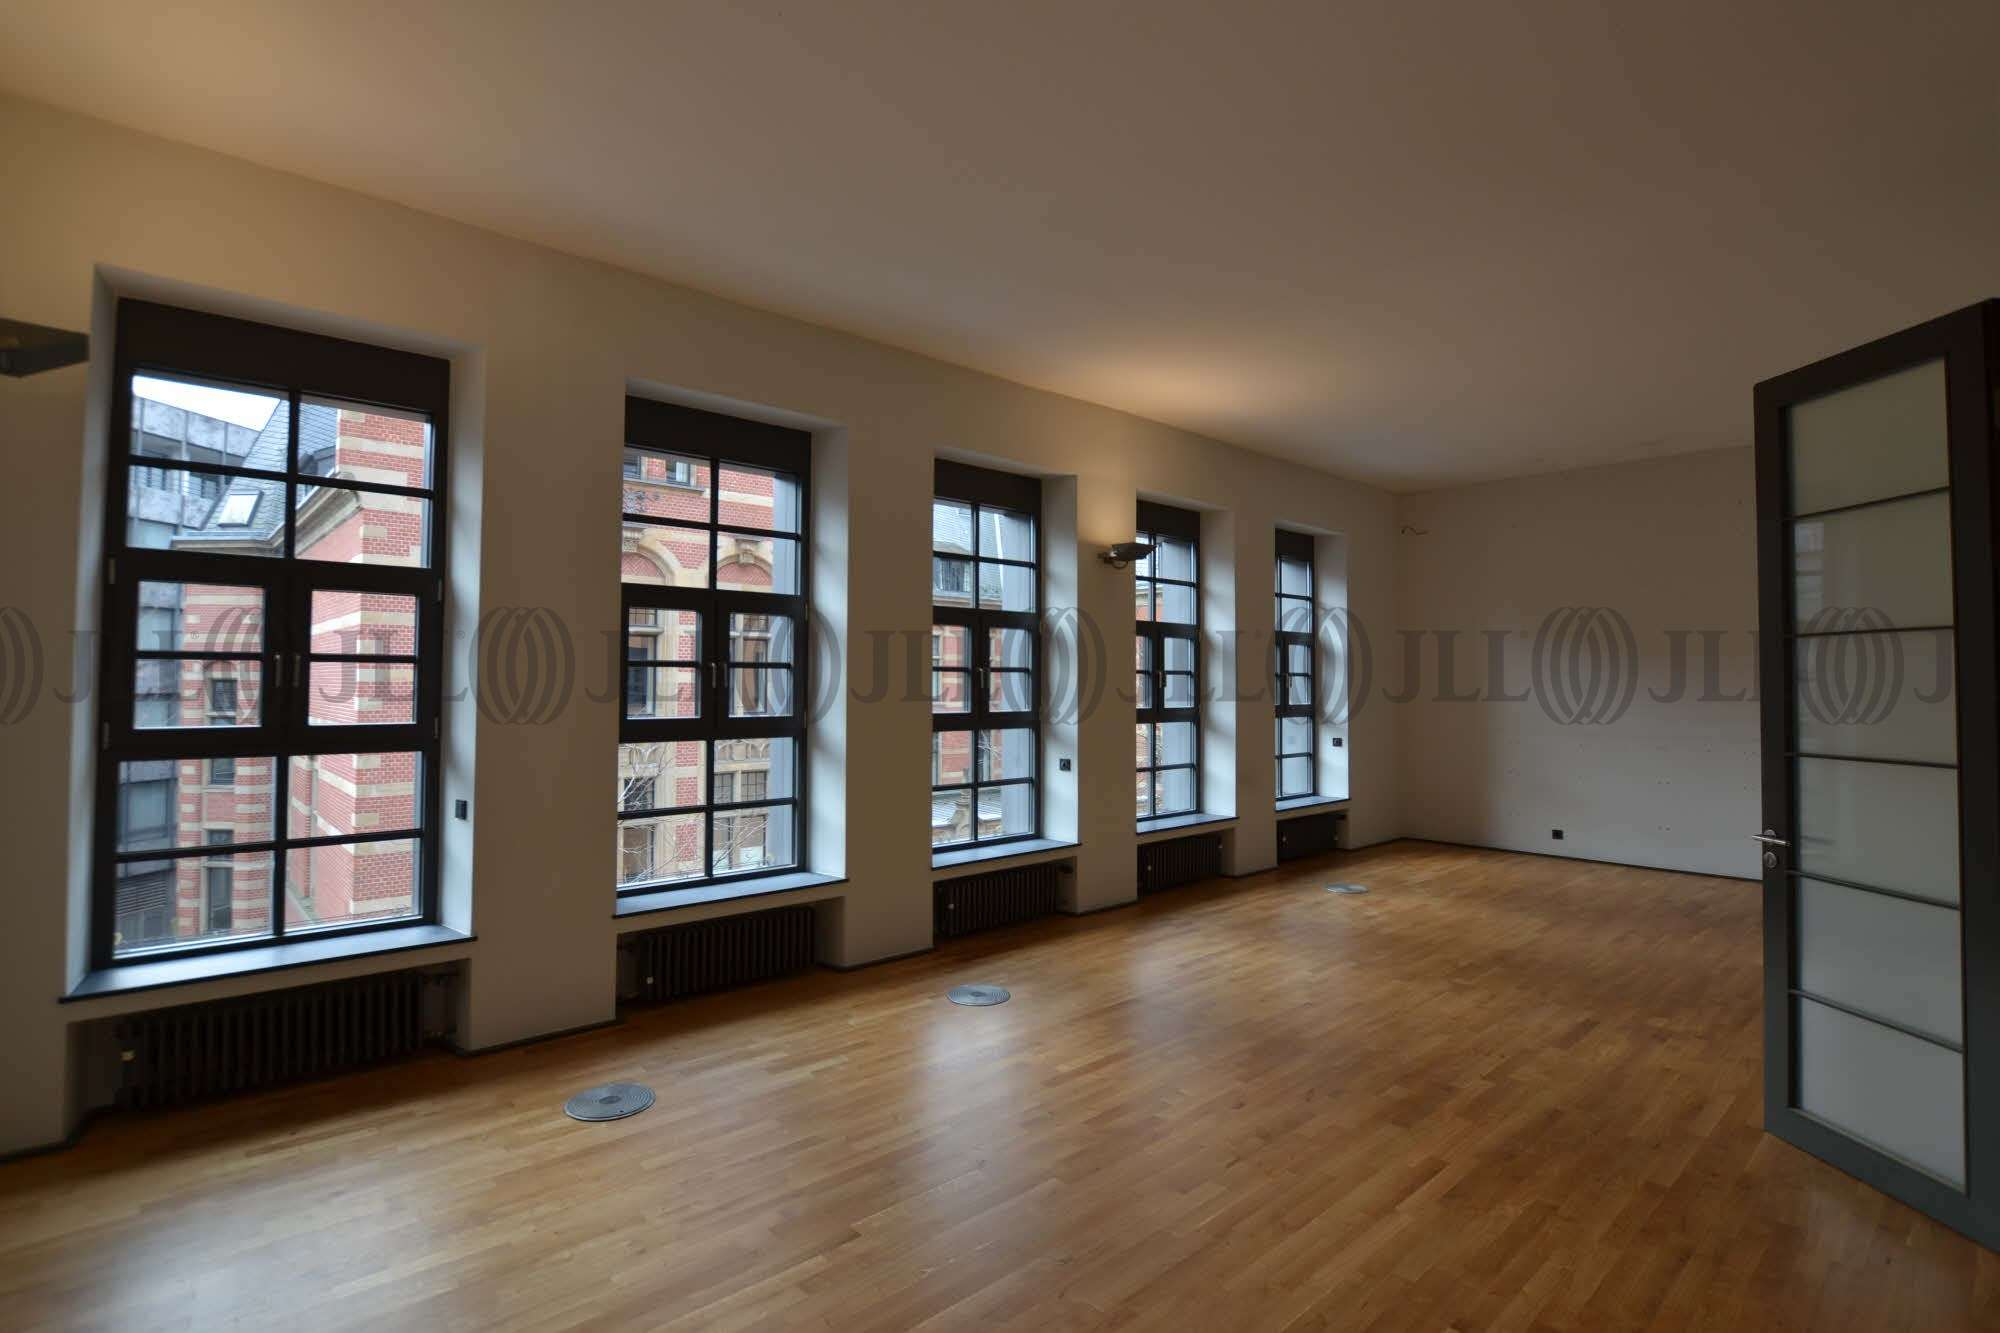 Büros Köln, 50672 - Büro - Köln, Neustadt-Nord - K0033 - 10043832